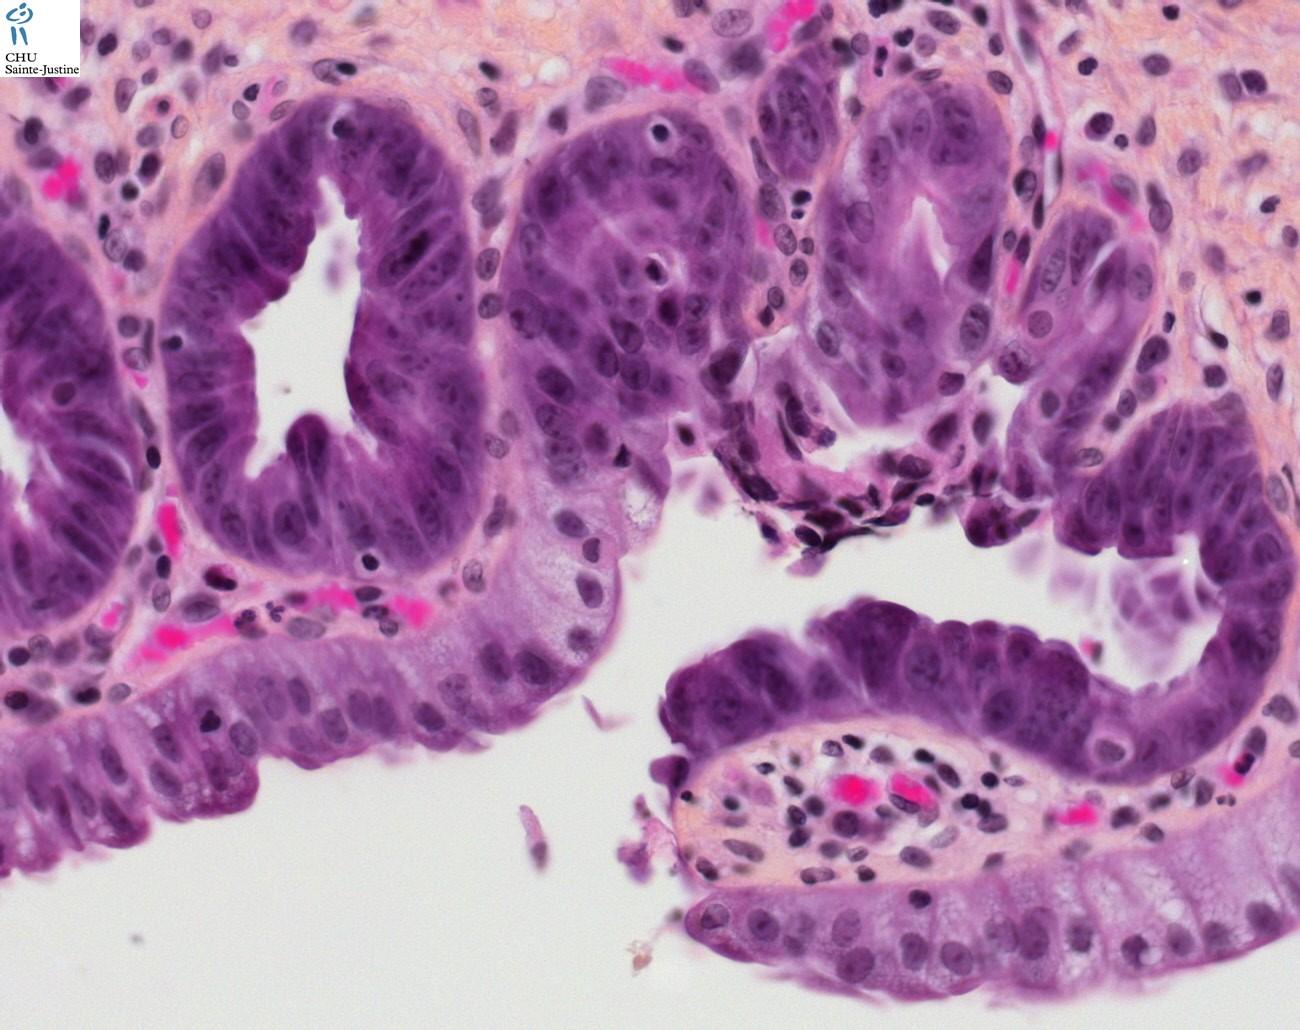 choledochal cyst - Humpath.com - Human pathology